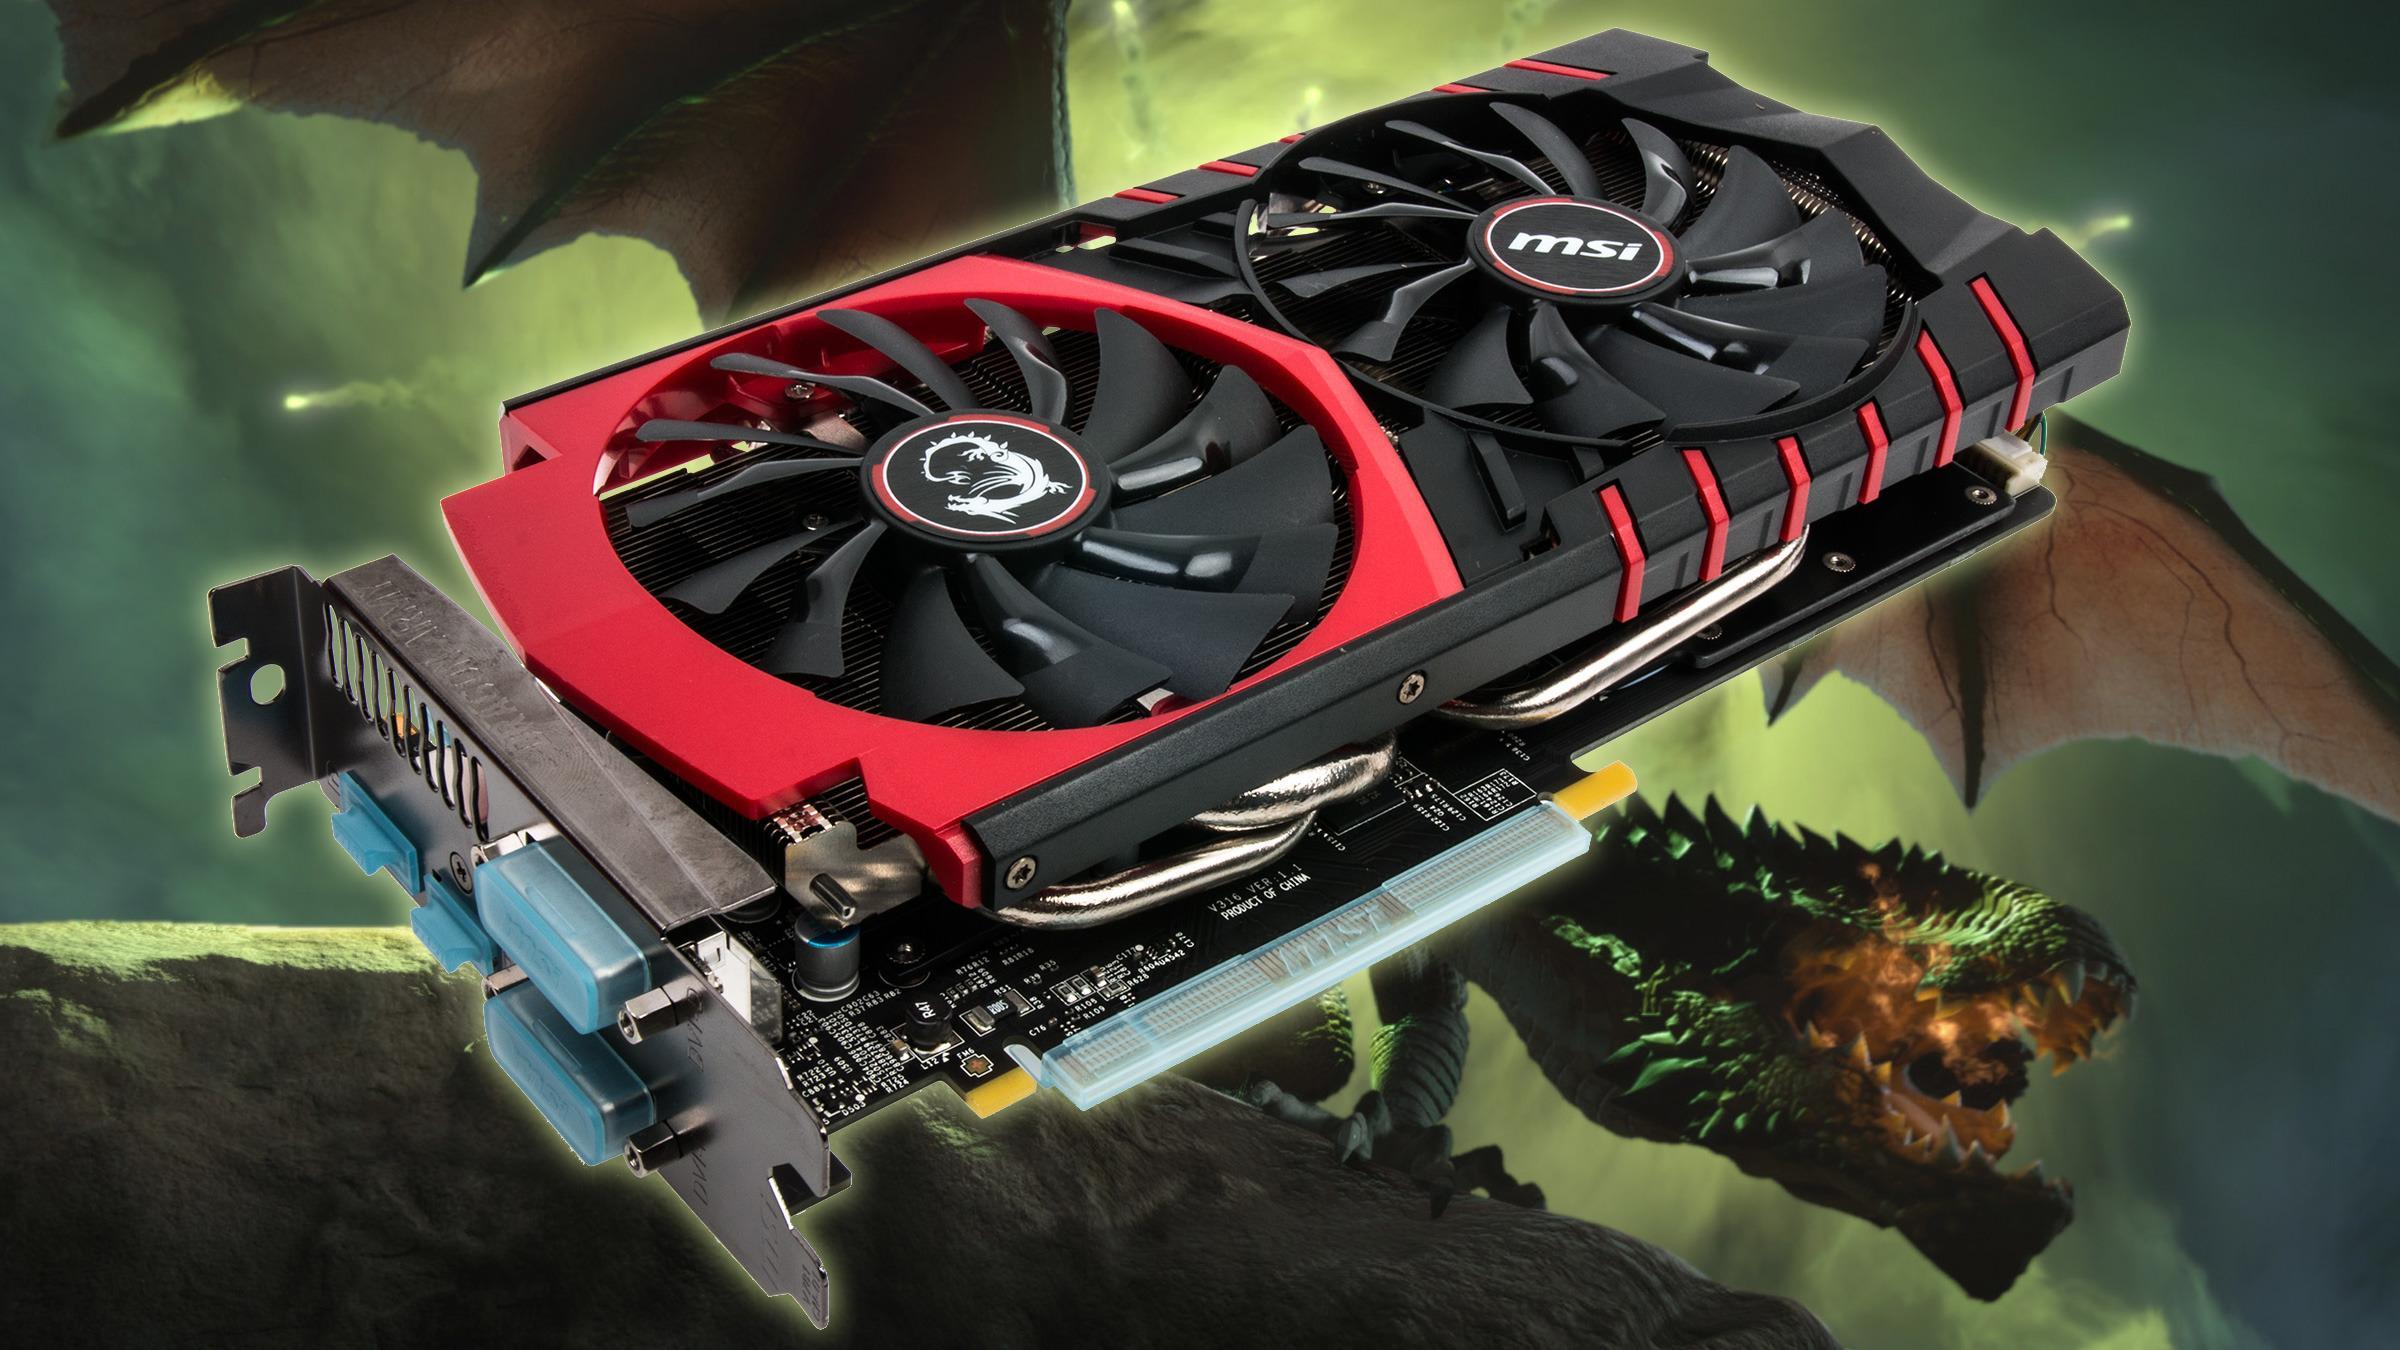 MSI GeForce GTX 970 Gaming 4G Twin Frozr V